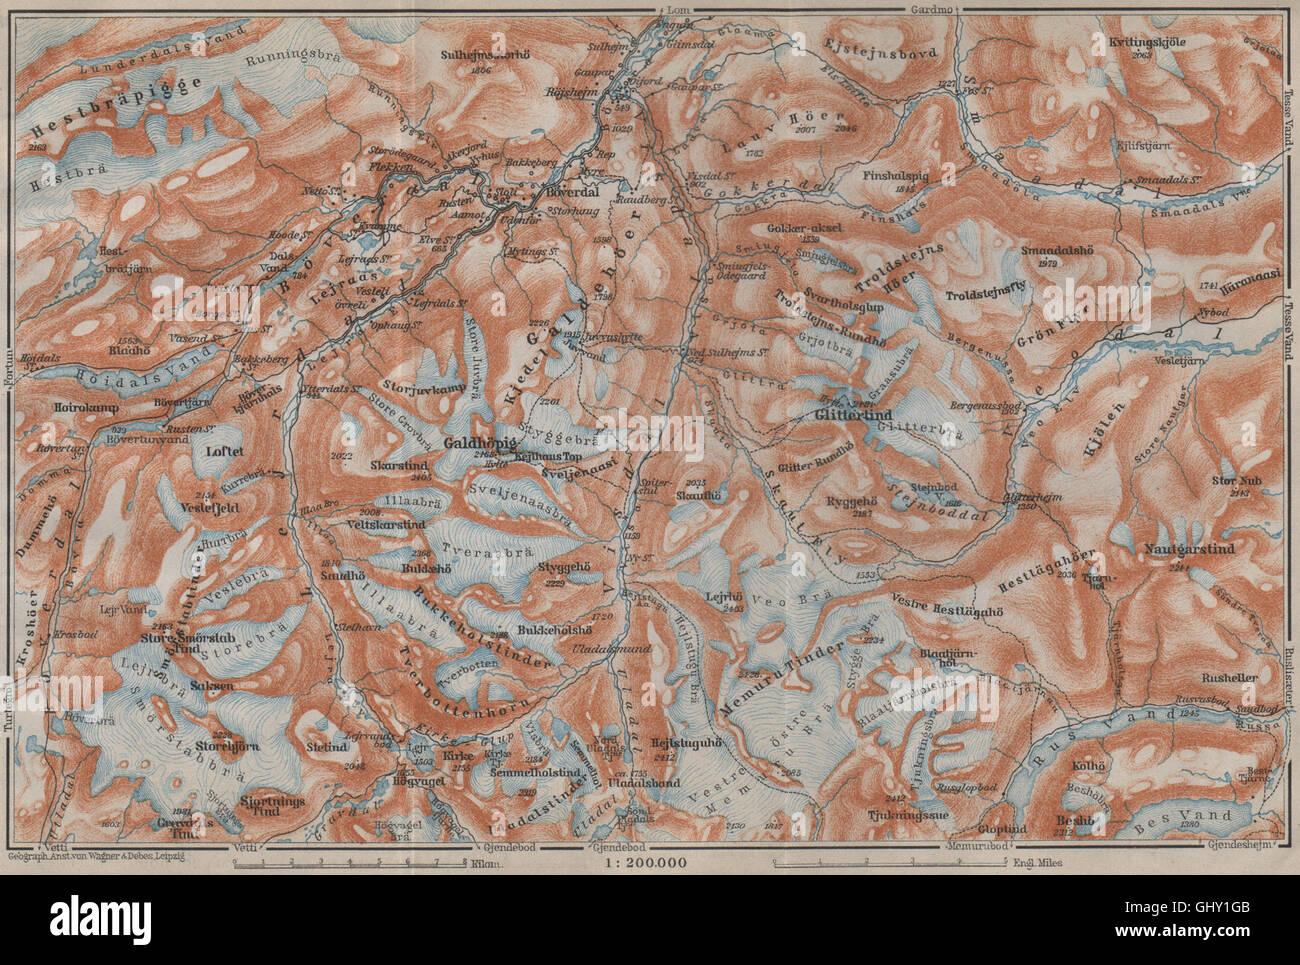 Galdhøpiggen and Glittertind mountains. Jotunheimen. Topo-map. Norway, 1912 - Stock Image